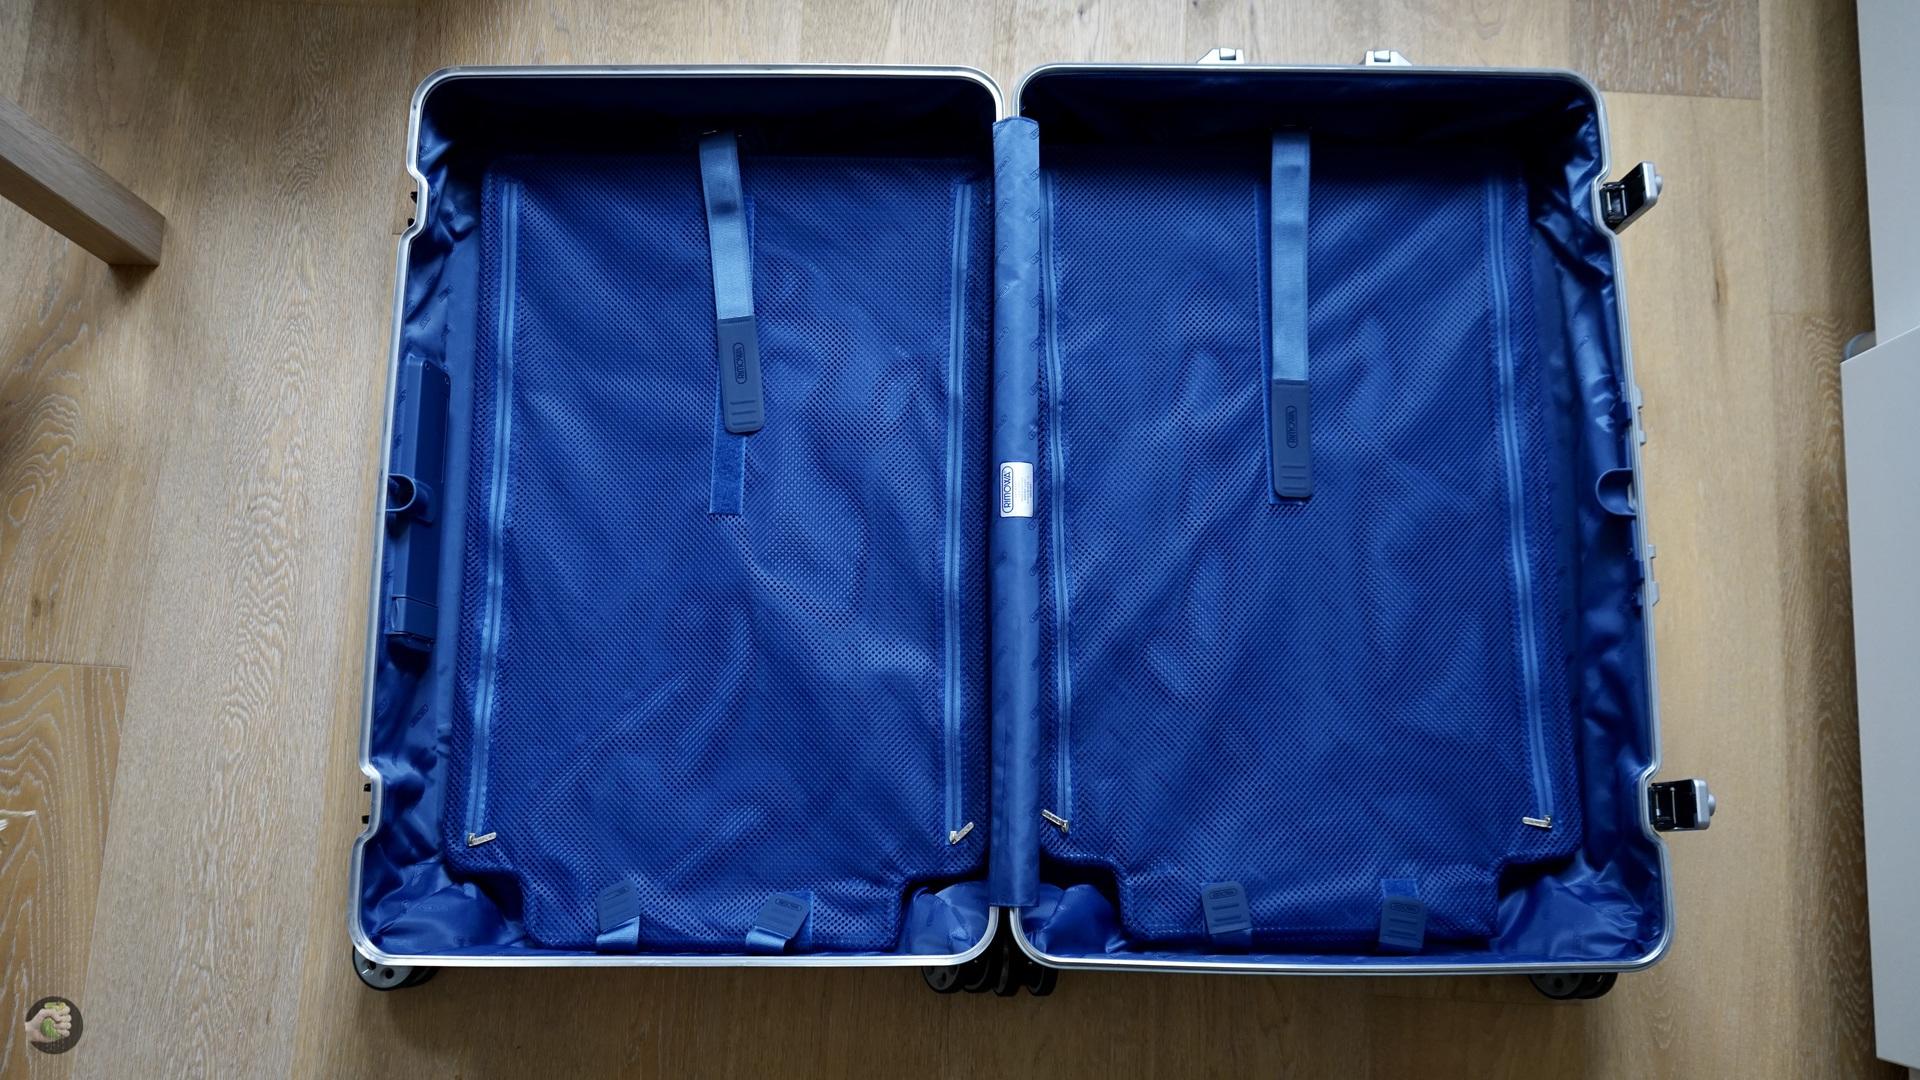 RIMOWA Topas Multiwheel Electronic Tag Luggage Review